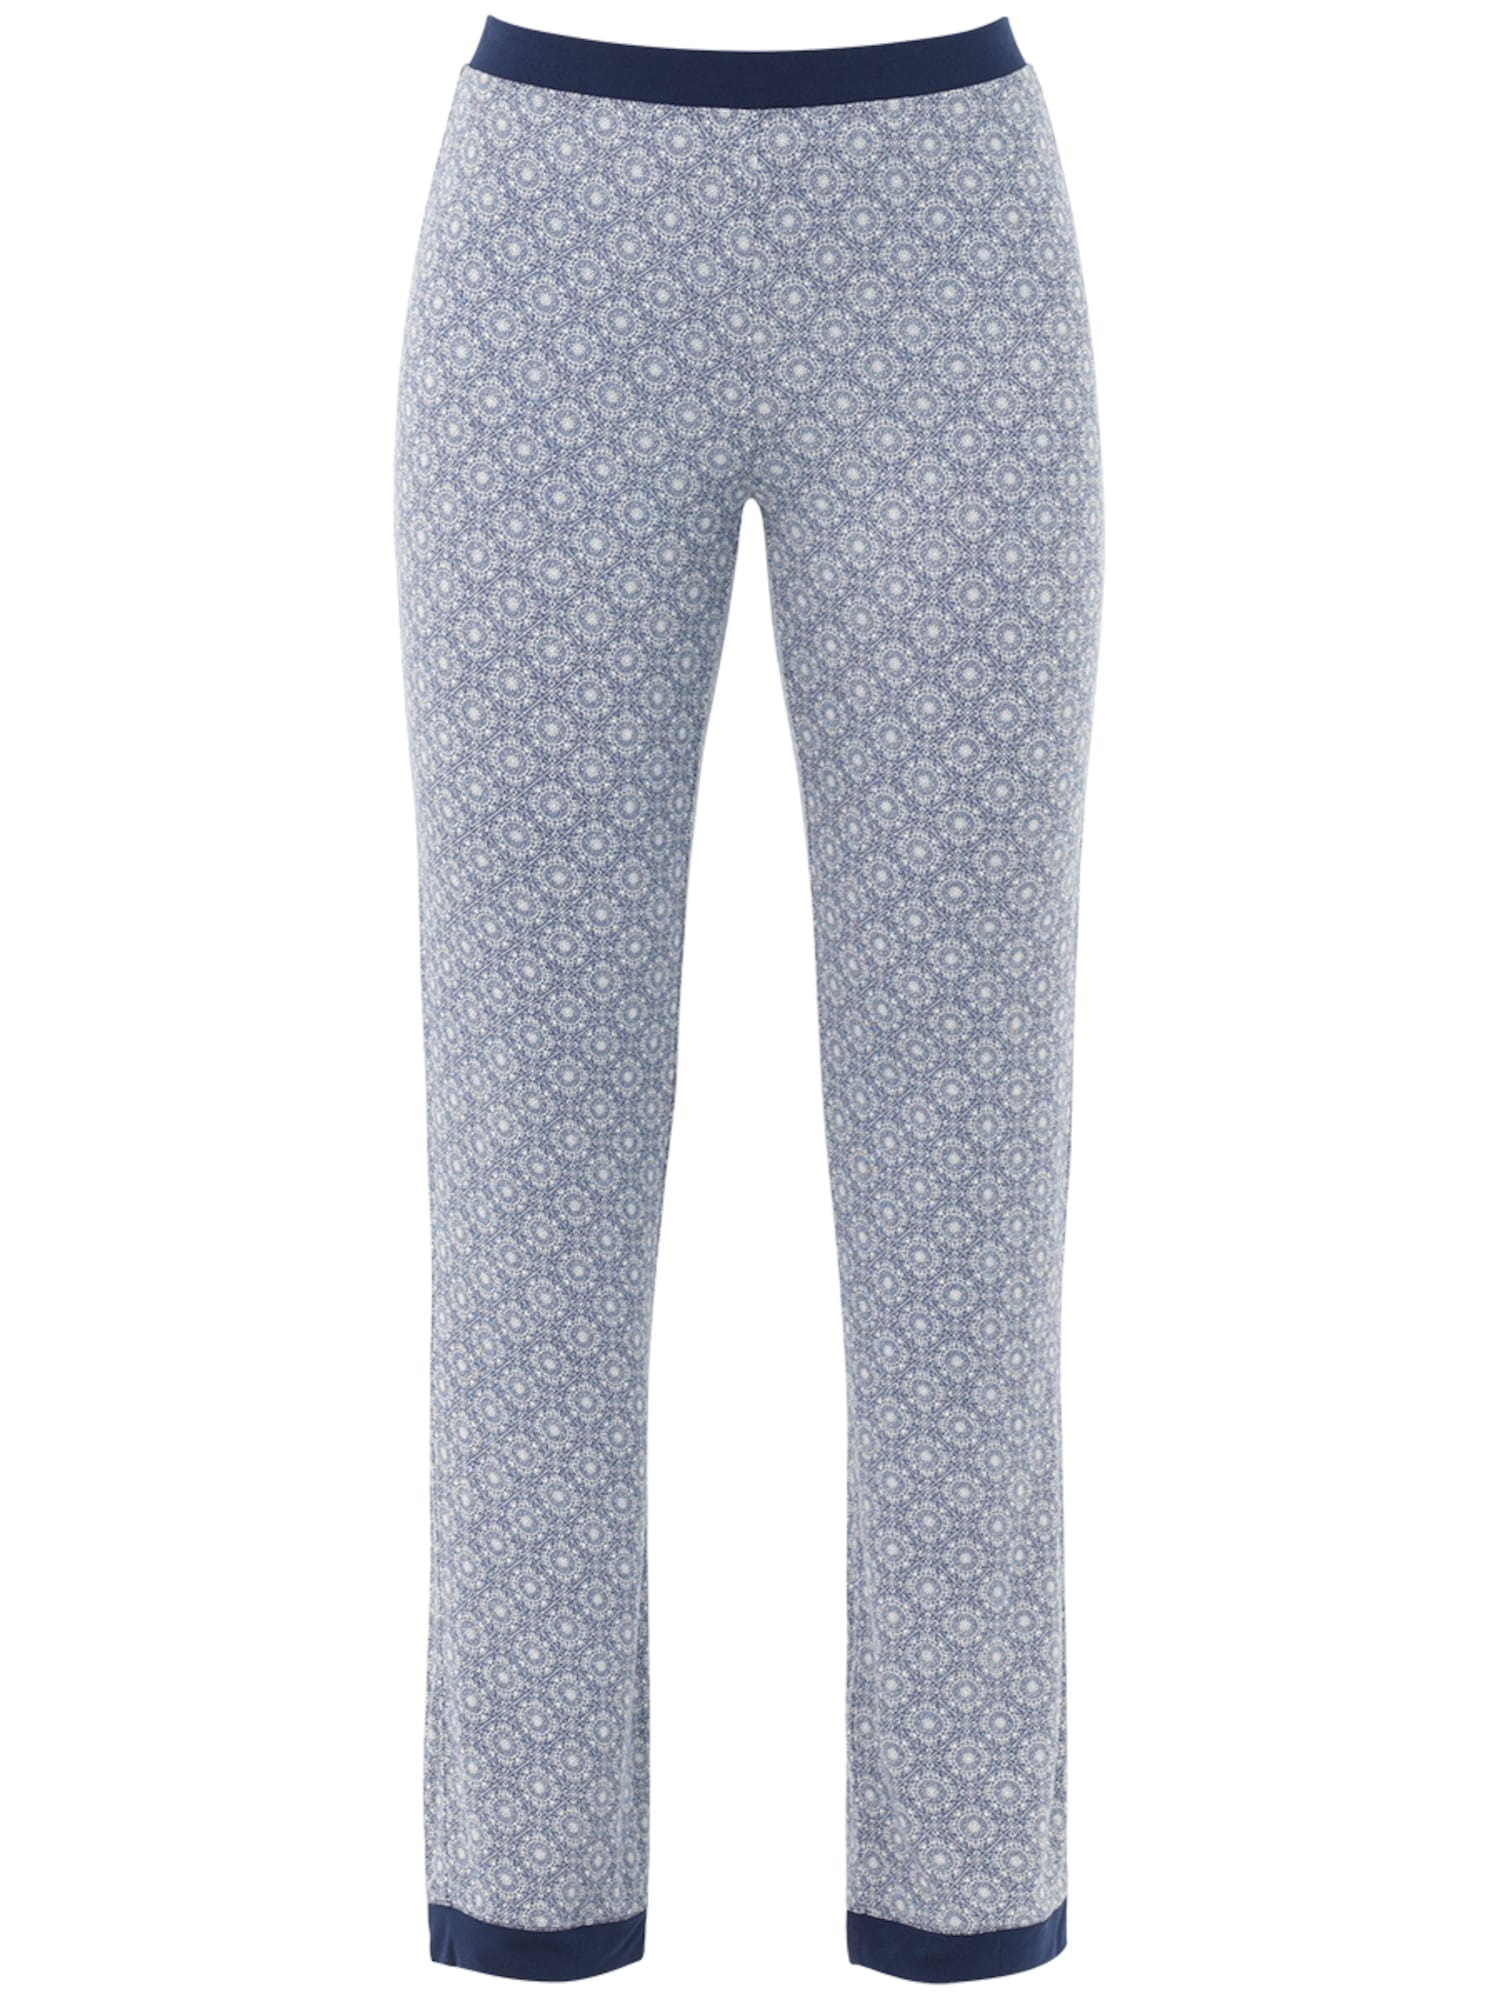 Pyžamové kalhoty Moroccan Nights tmavě modrá bílá PALMERS